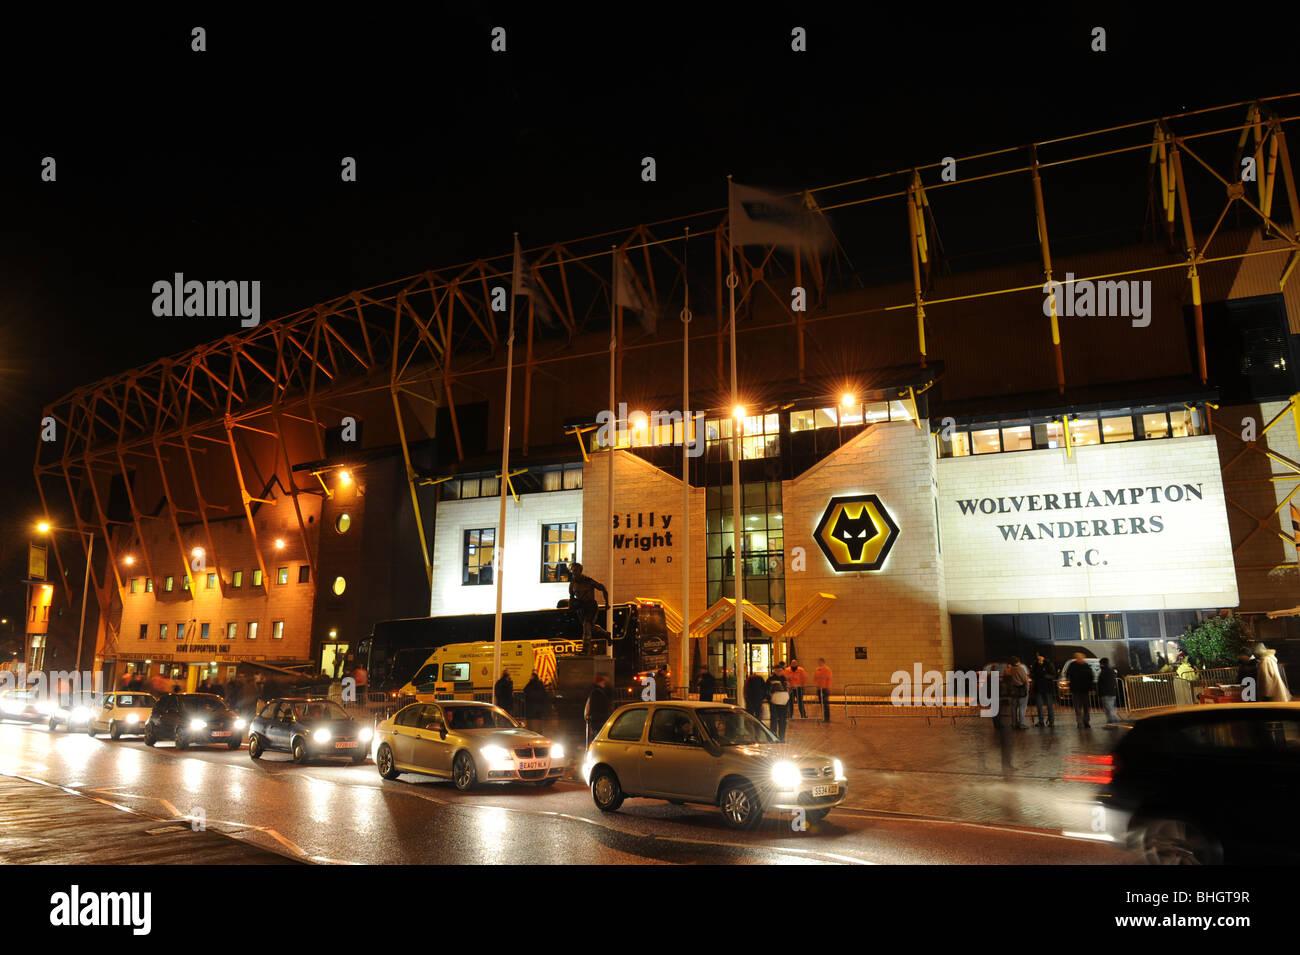 Molineux stadium at night home of Wolverhampton Wanderers Football Club - Stock Image